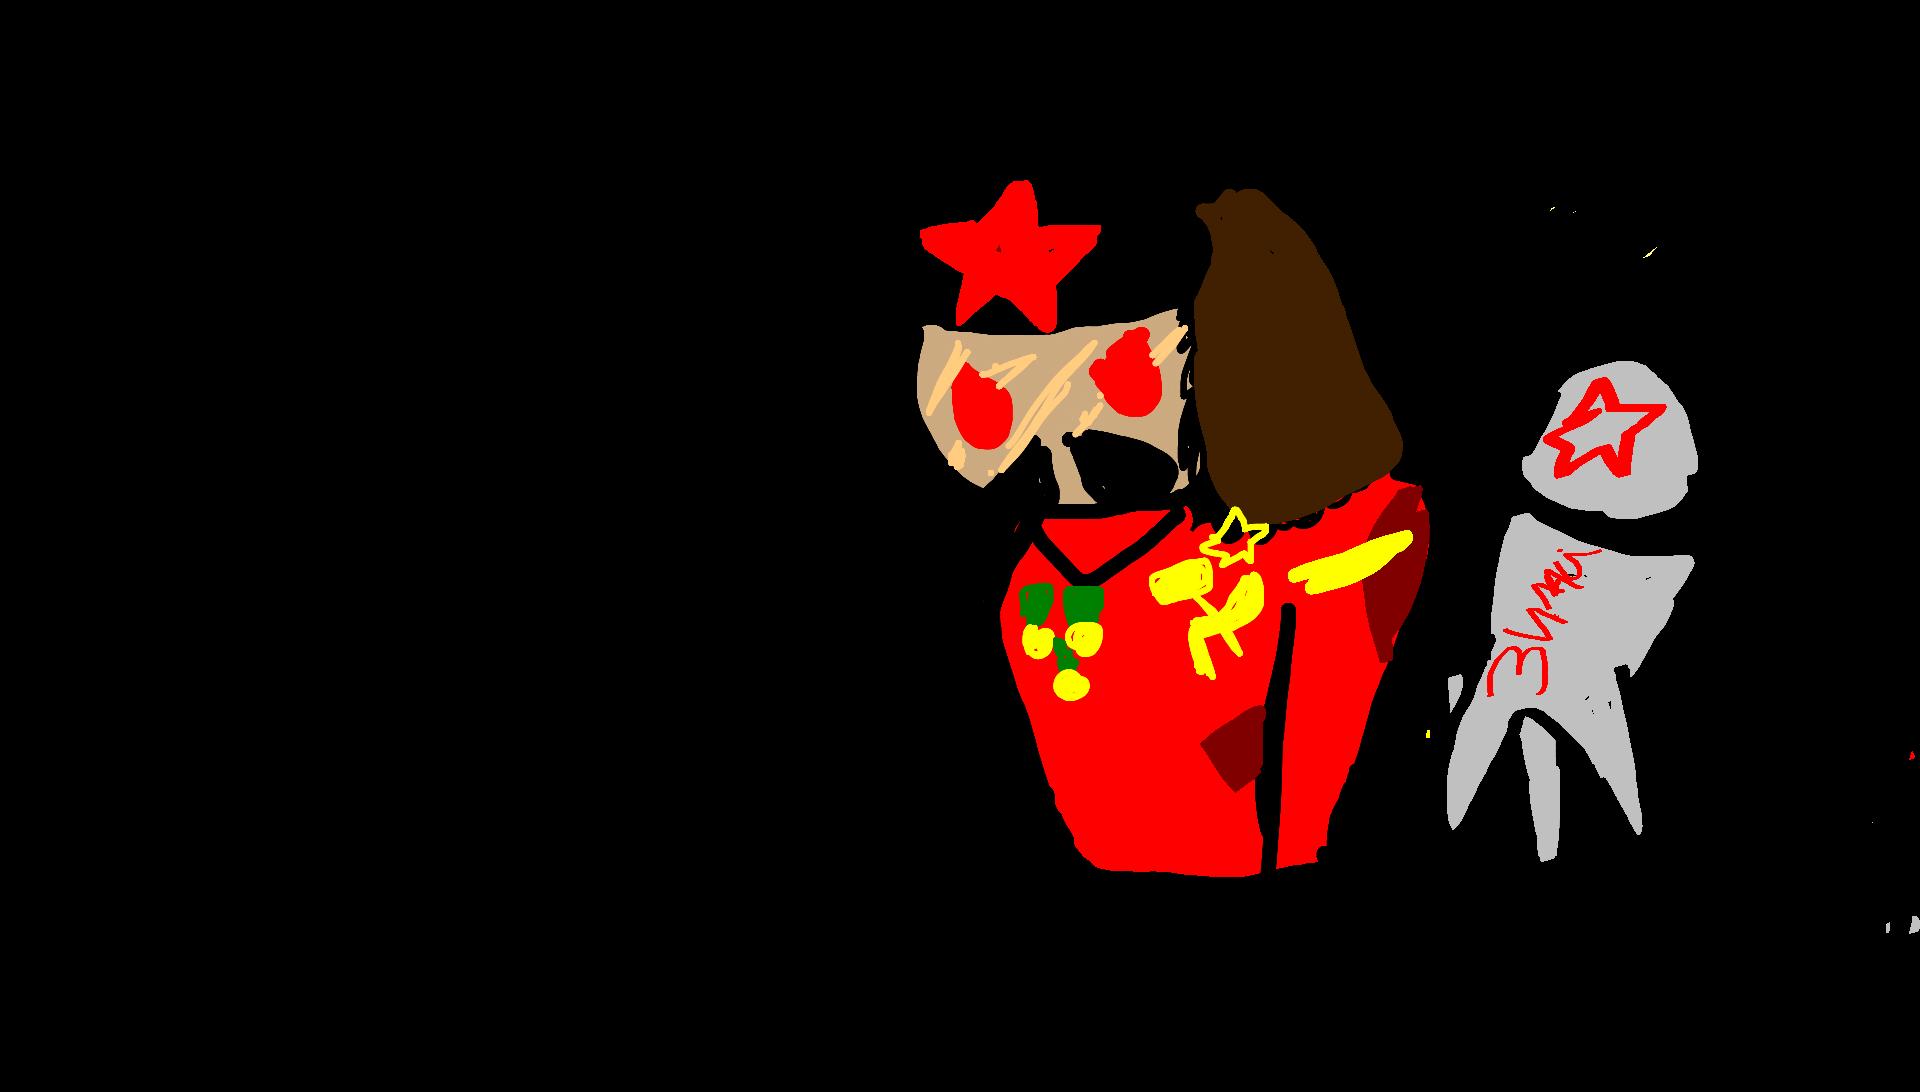 Btother (Comrade) Soviet Russia satwcomic.com